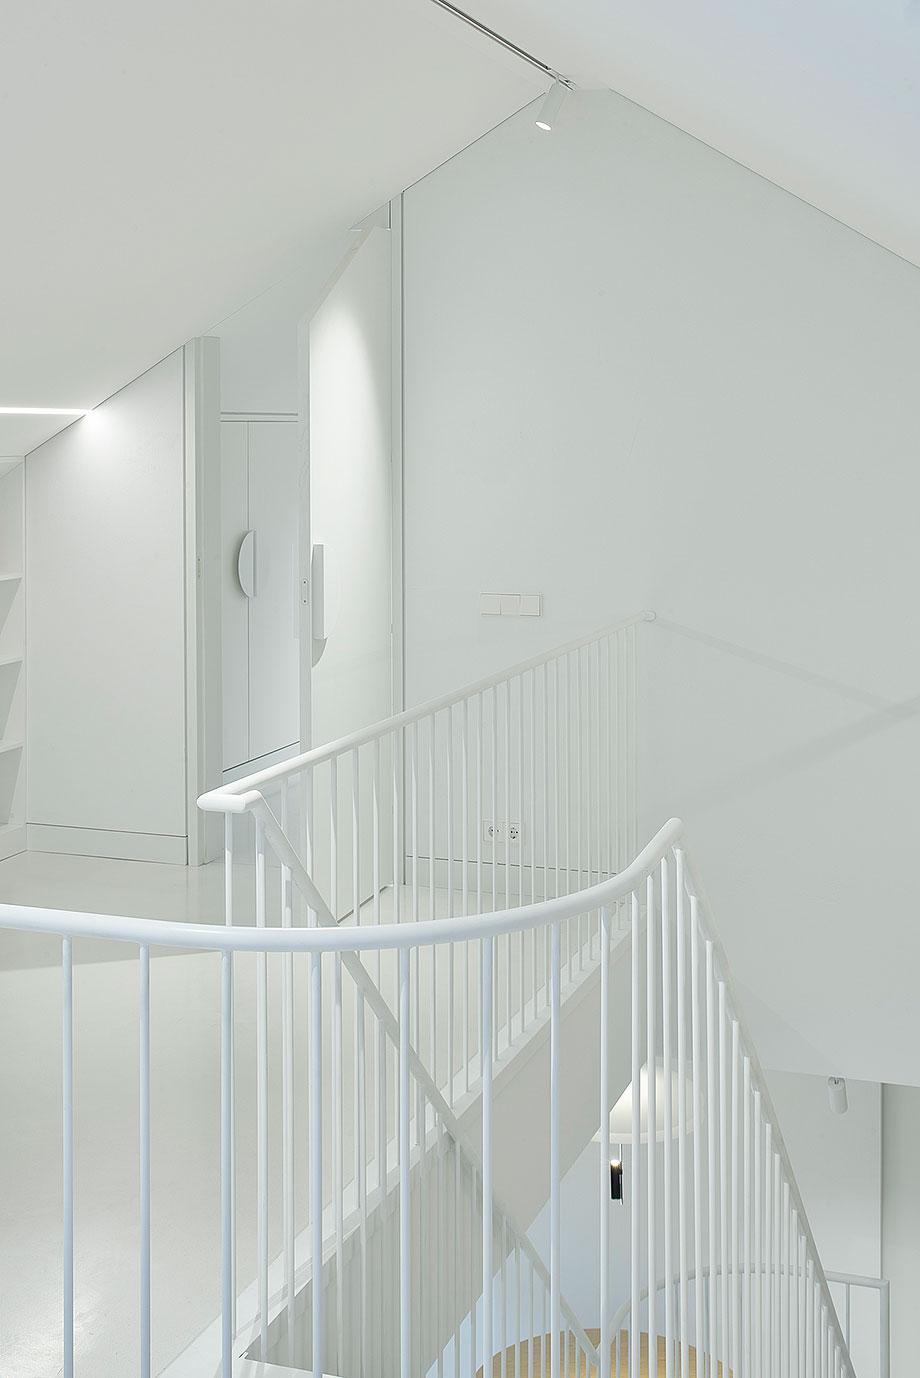 apartamento con un muro de piedra revestido con travertino por 2xj architects (9) - foto darius petrulaitis